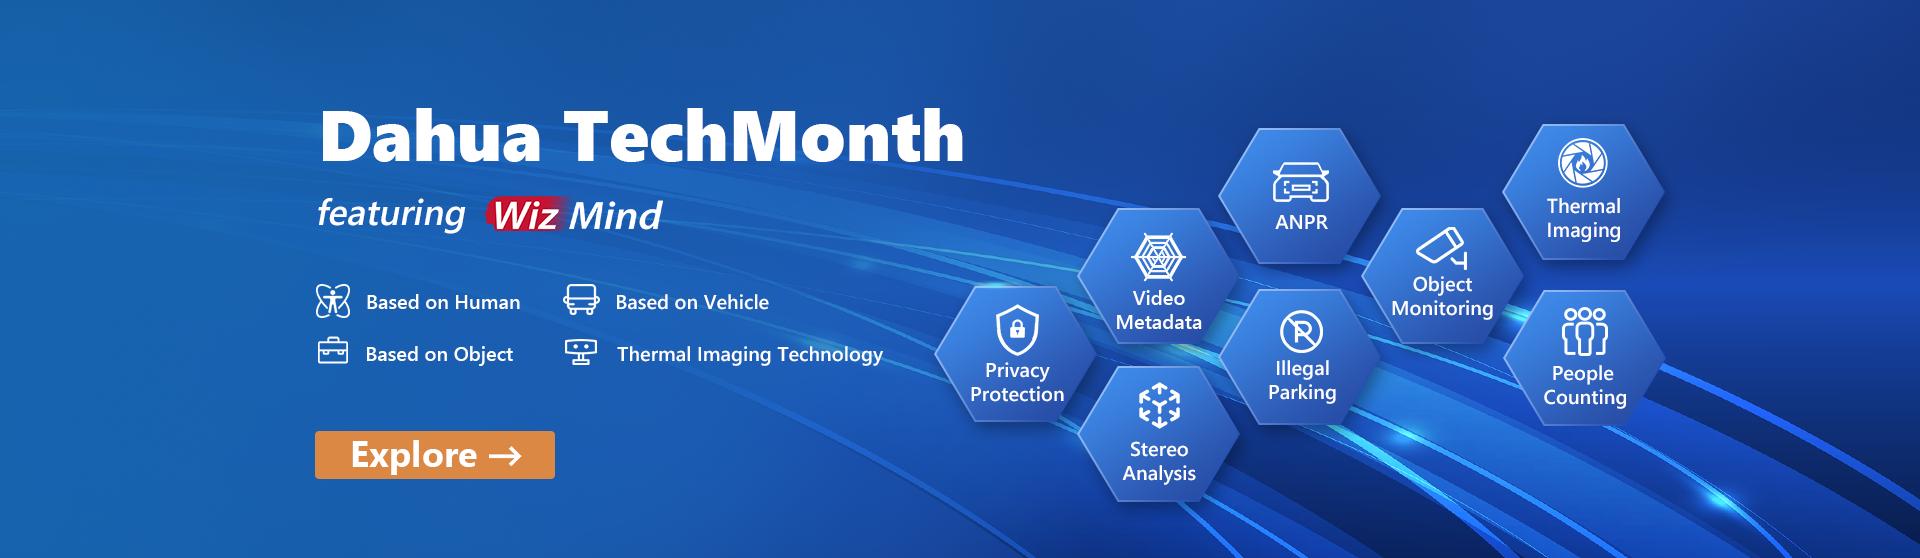 Dahua Technology - Leading Video Surveillance Solution Provider ...